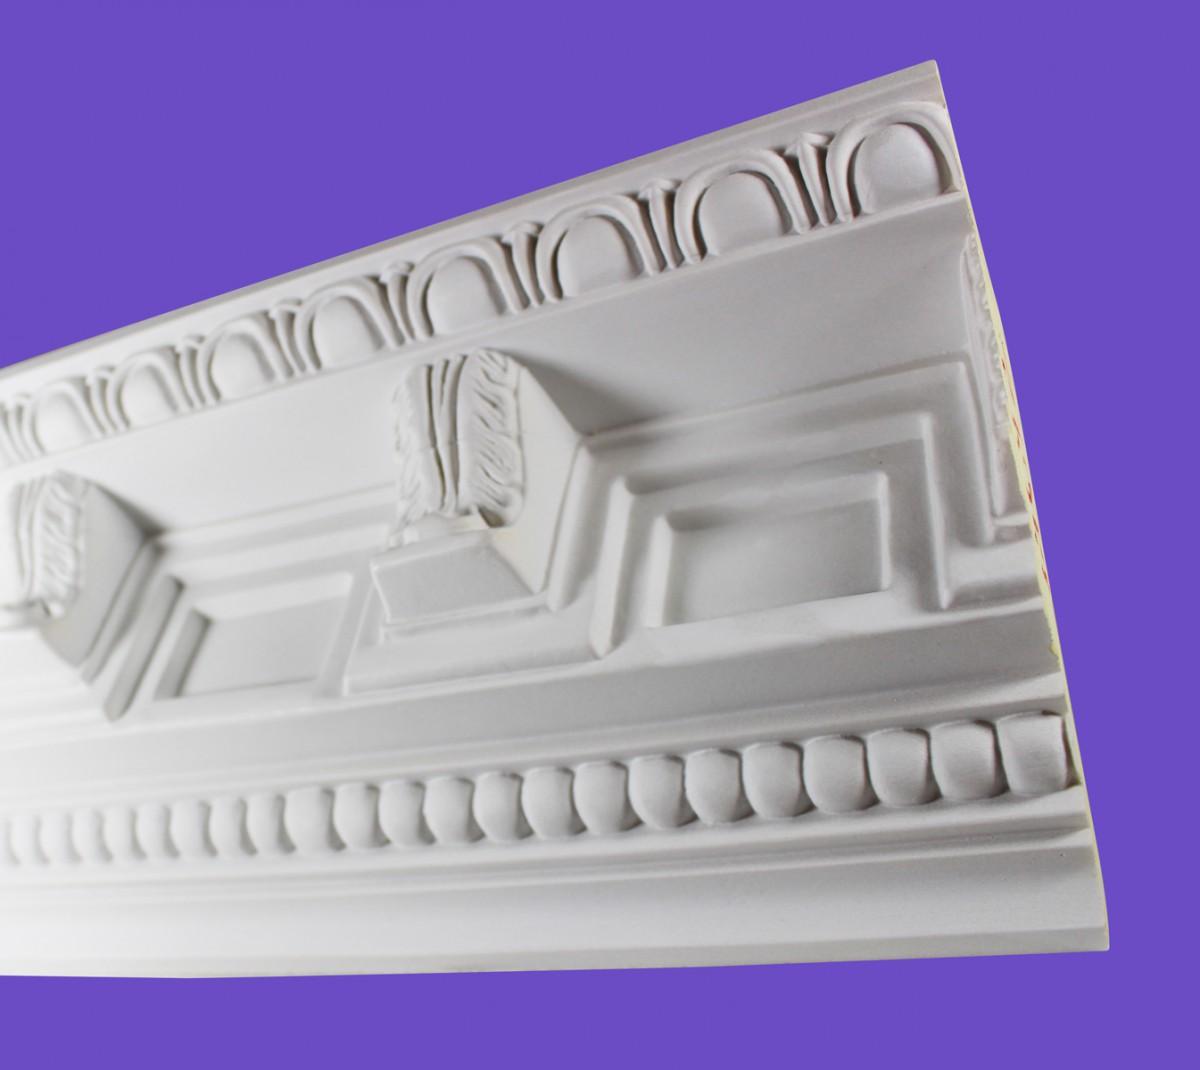 Cornice White Urethane 19 Cornice Sample of 20416 Cornice Cornice Moulding Cornice Molding